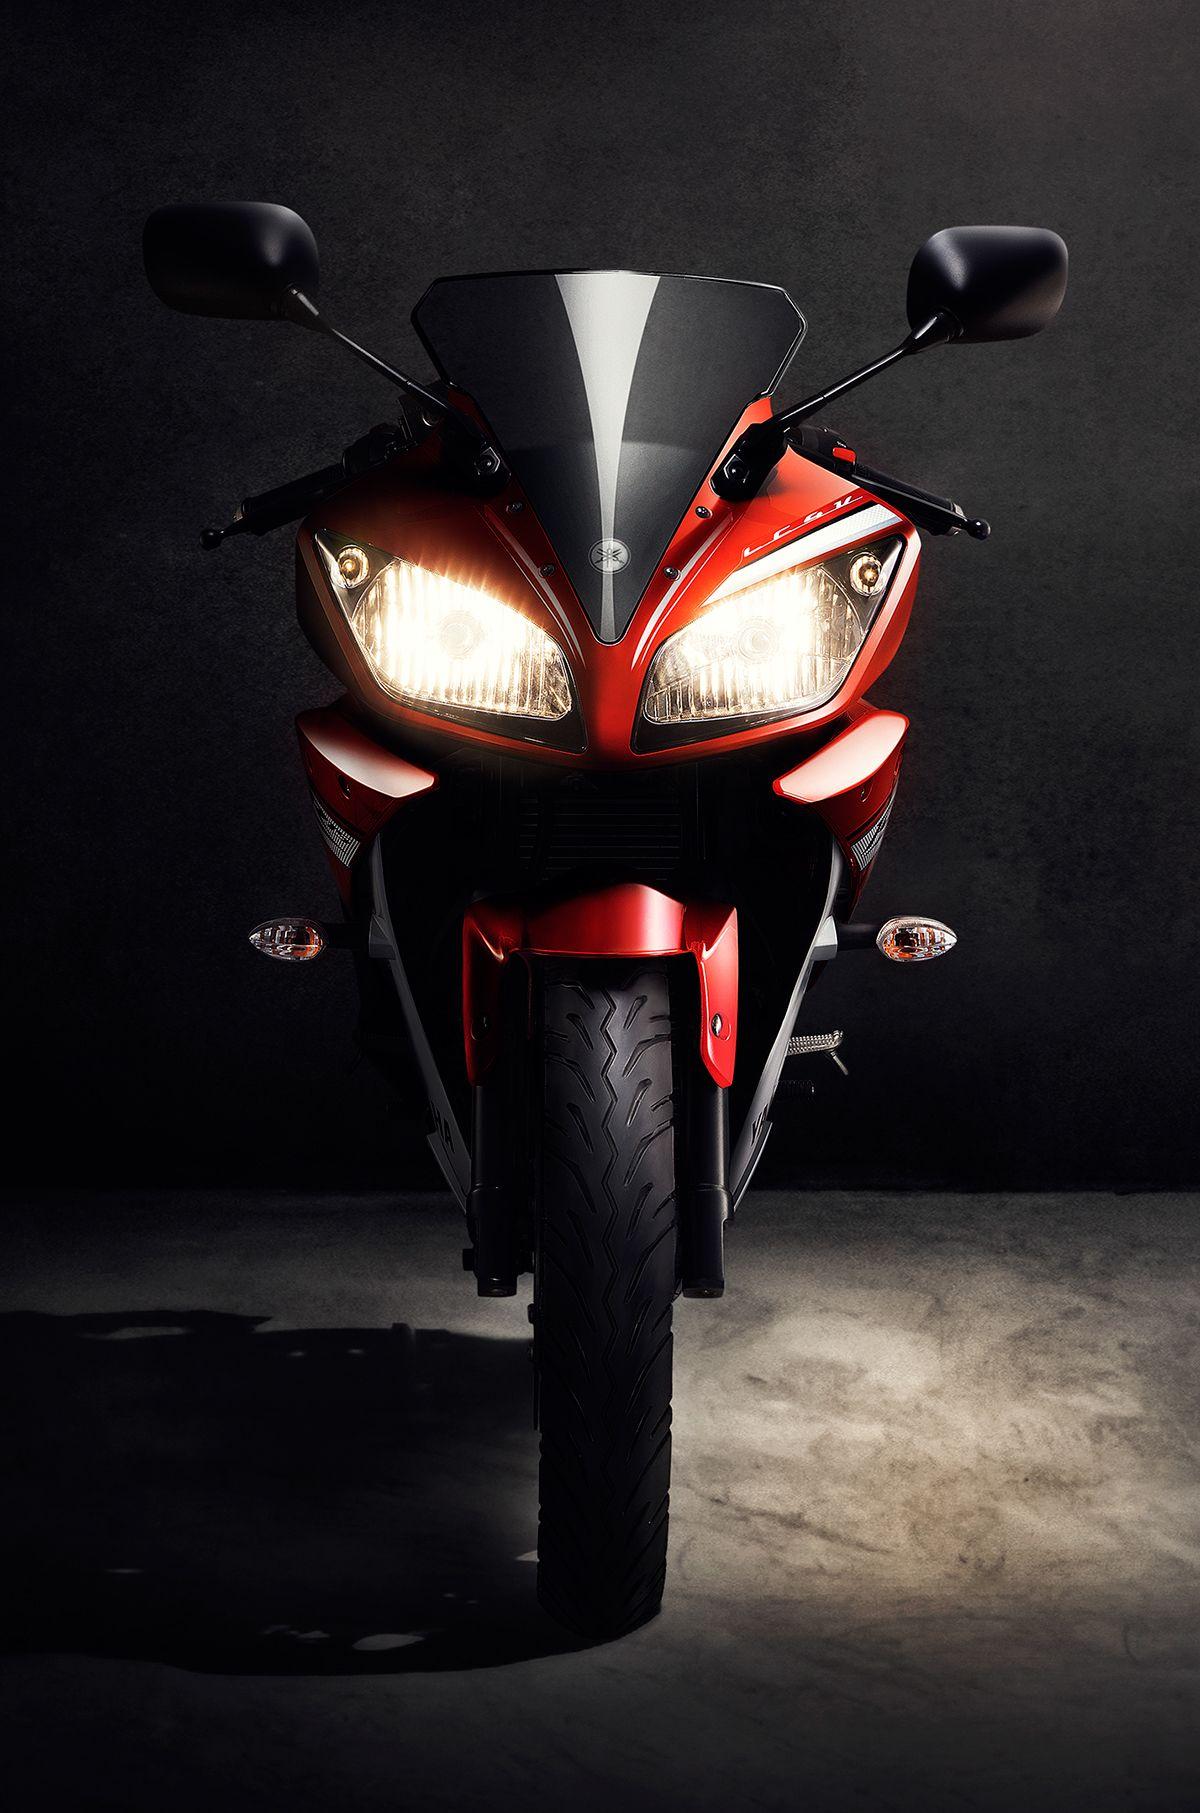 Hd wallpaper yamaha r15 - Concept Development Creative Retouching For Yamaha R15